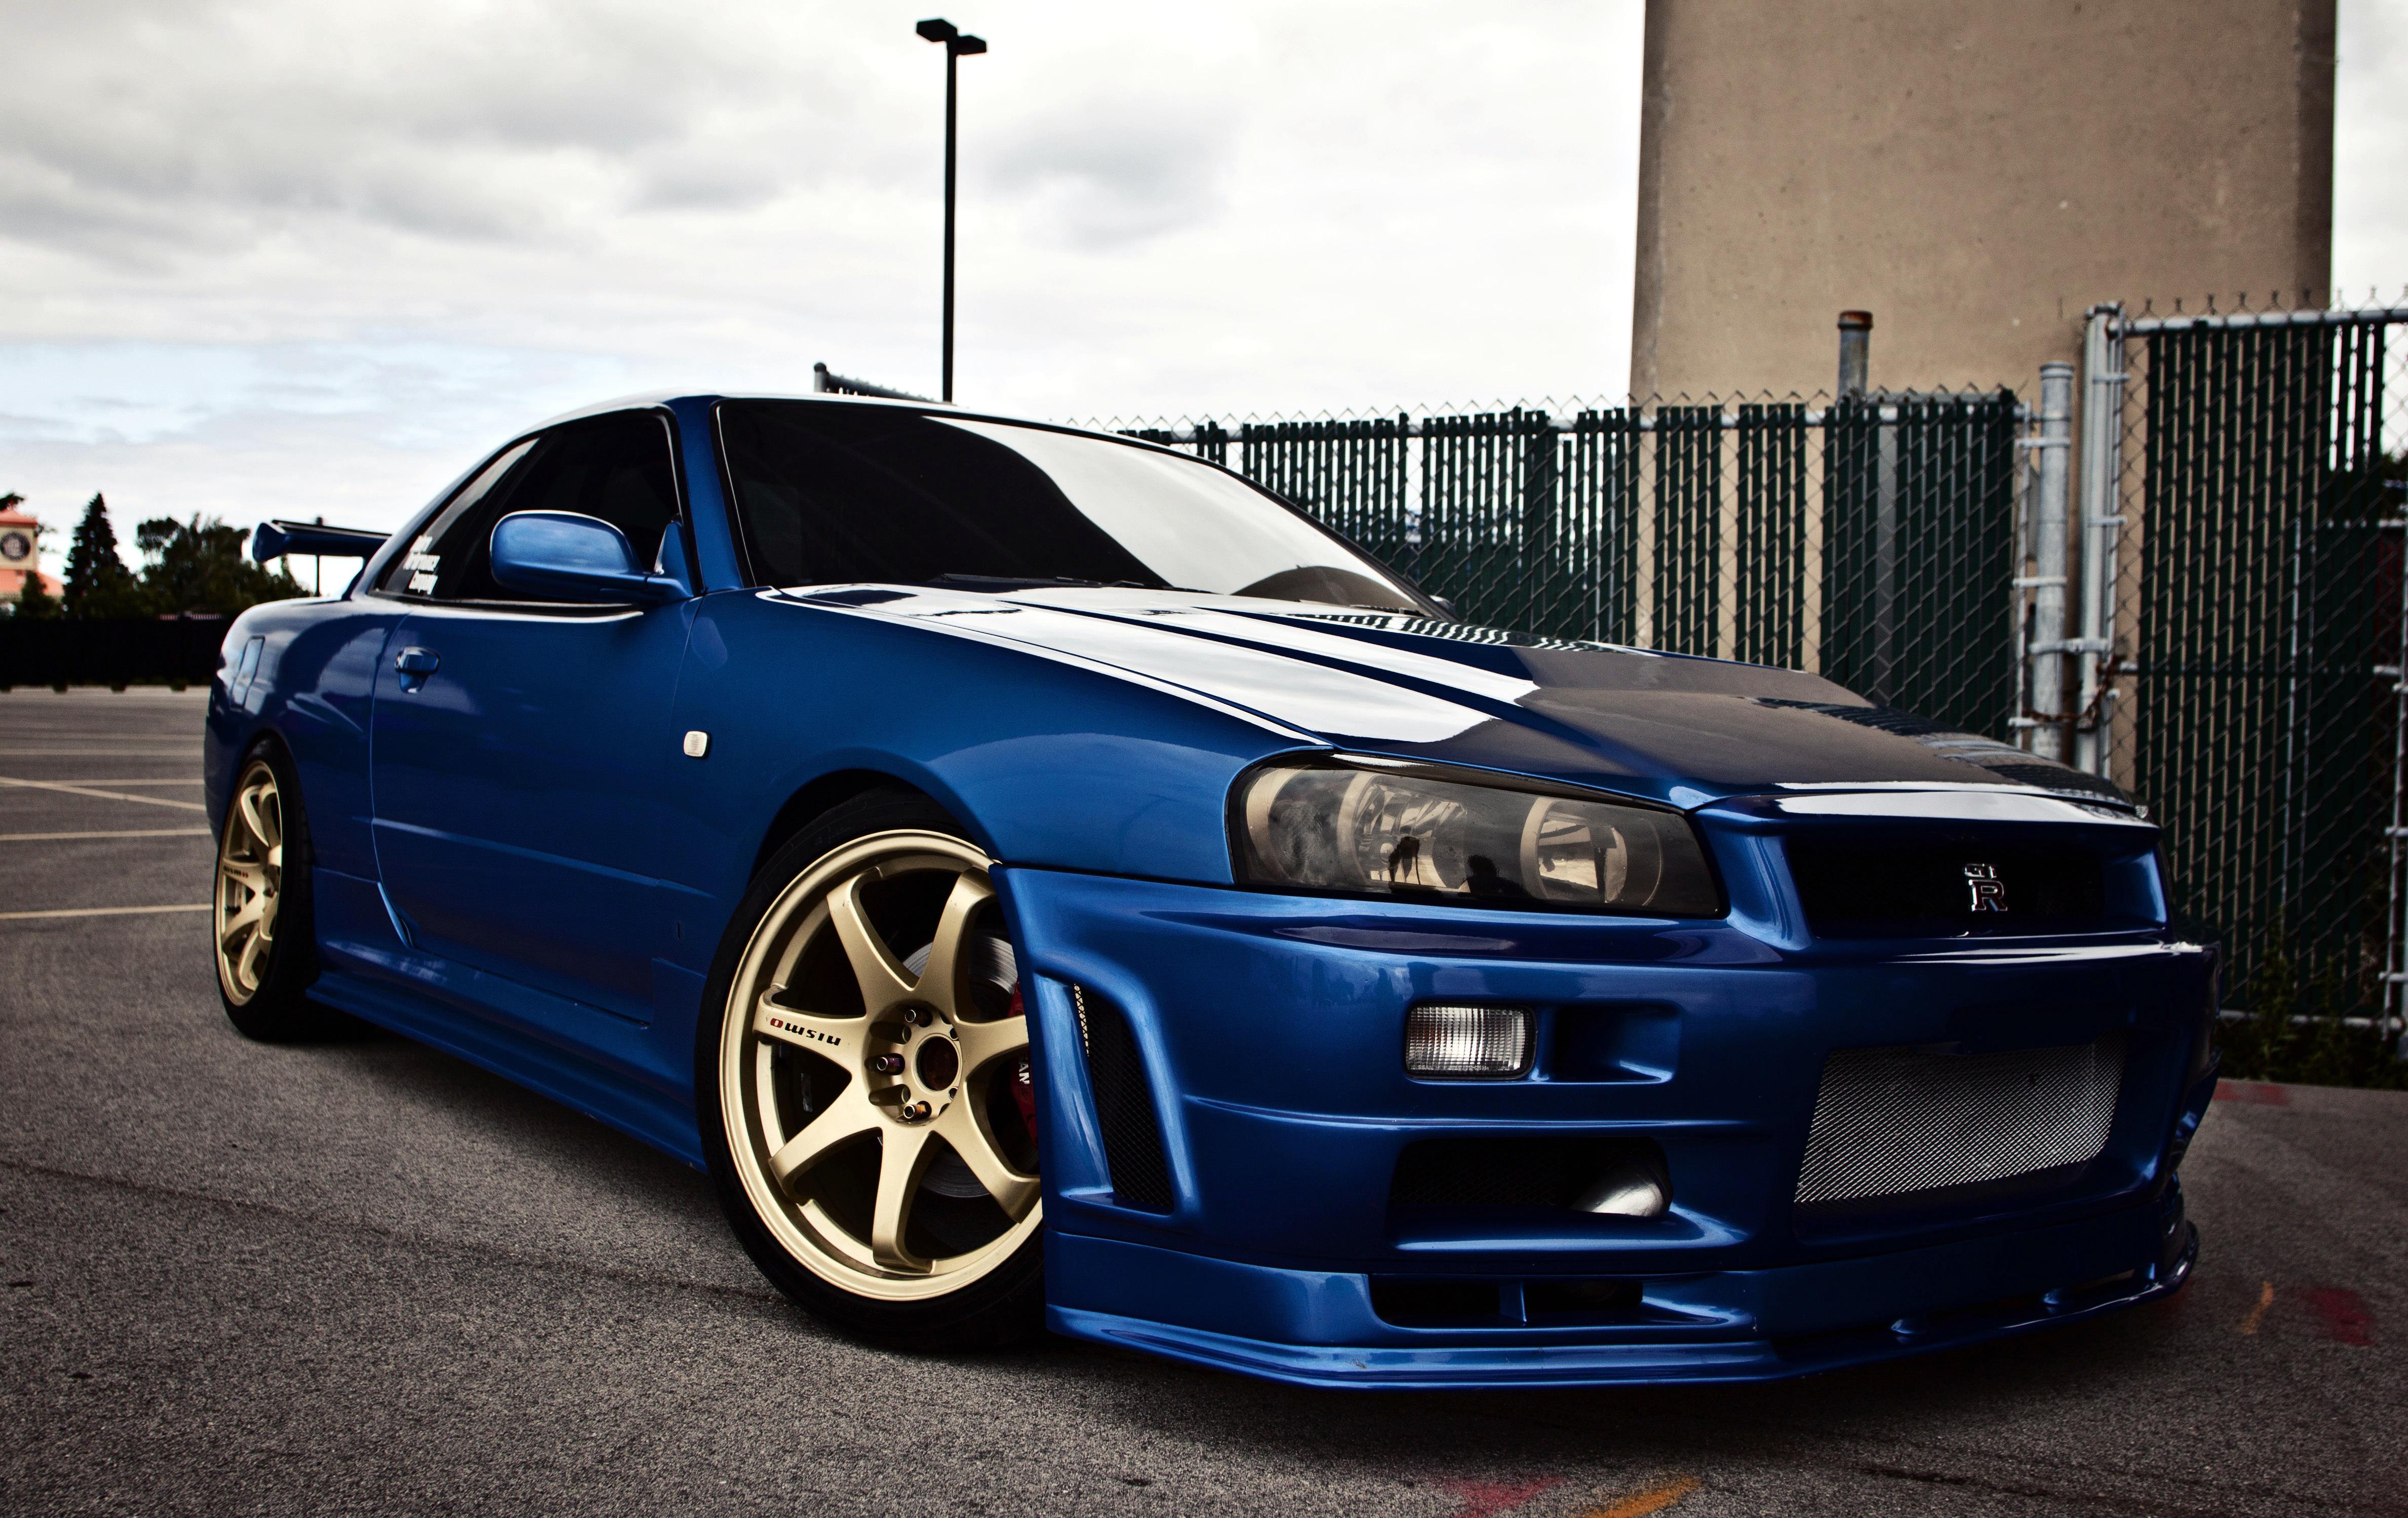 Nissan skyline gtr r34 blue wallpaper photos pictures 4752x2995